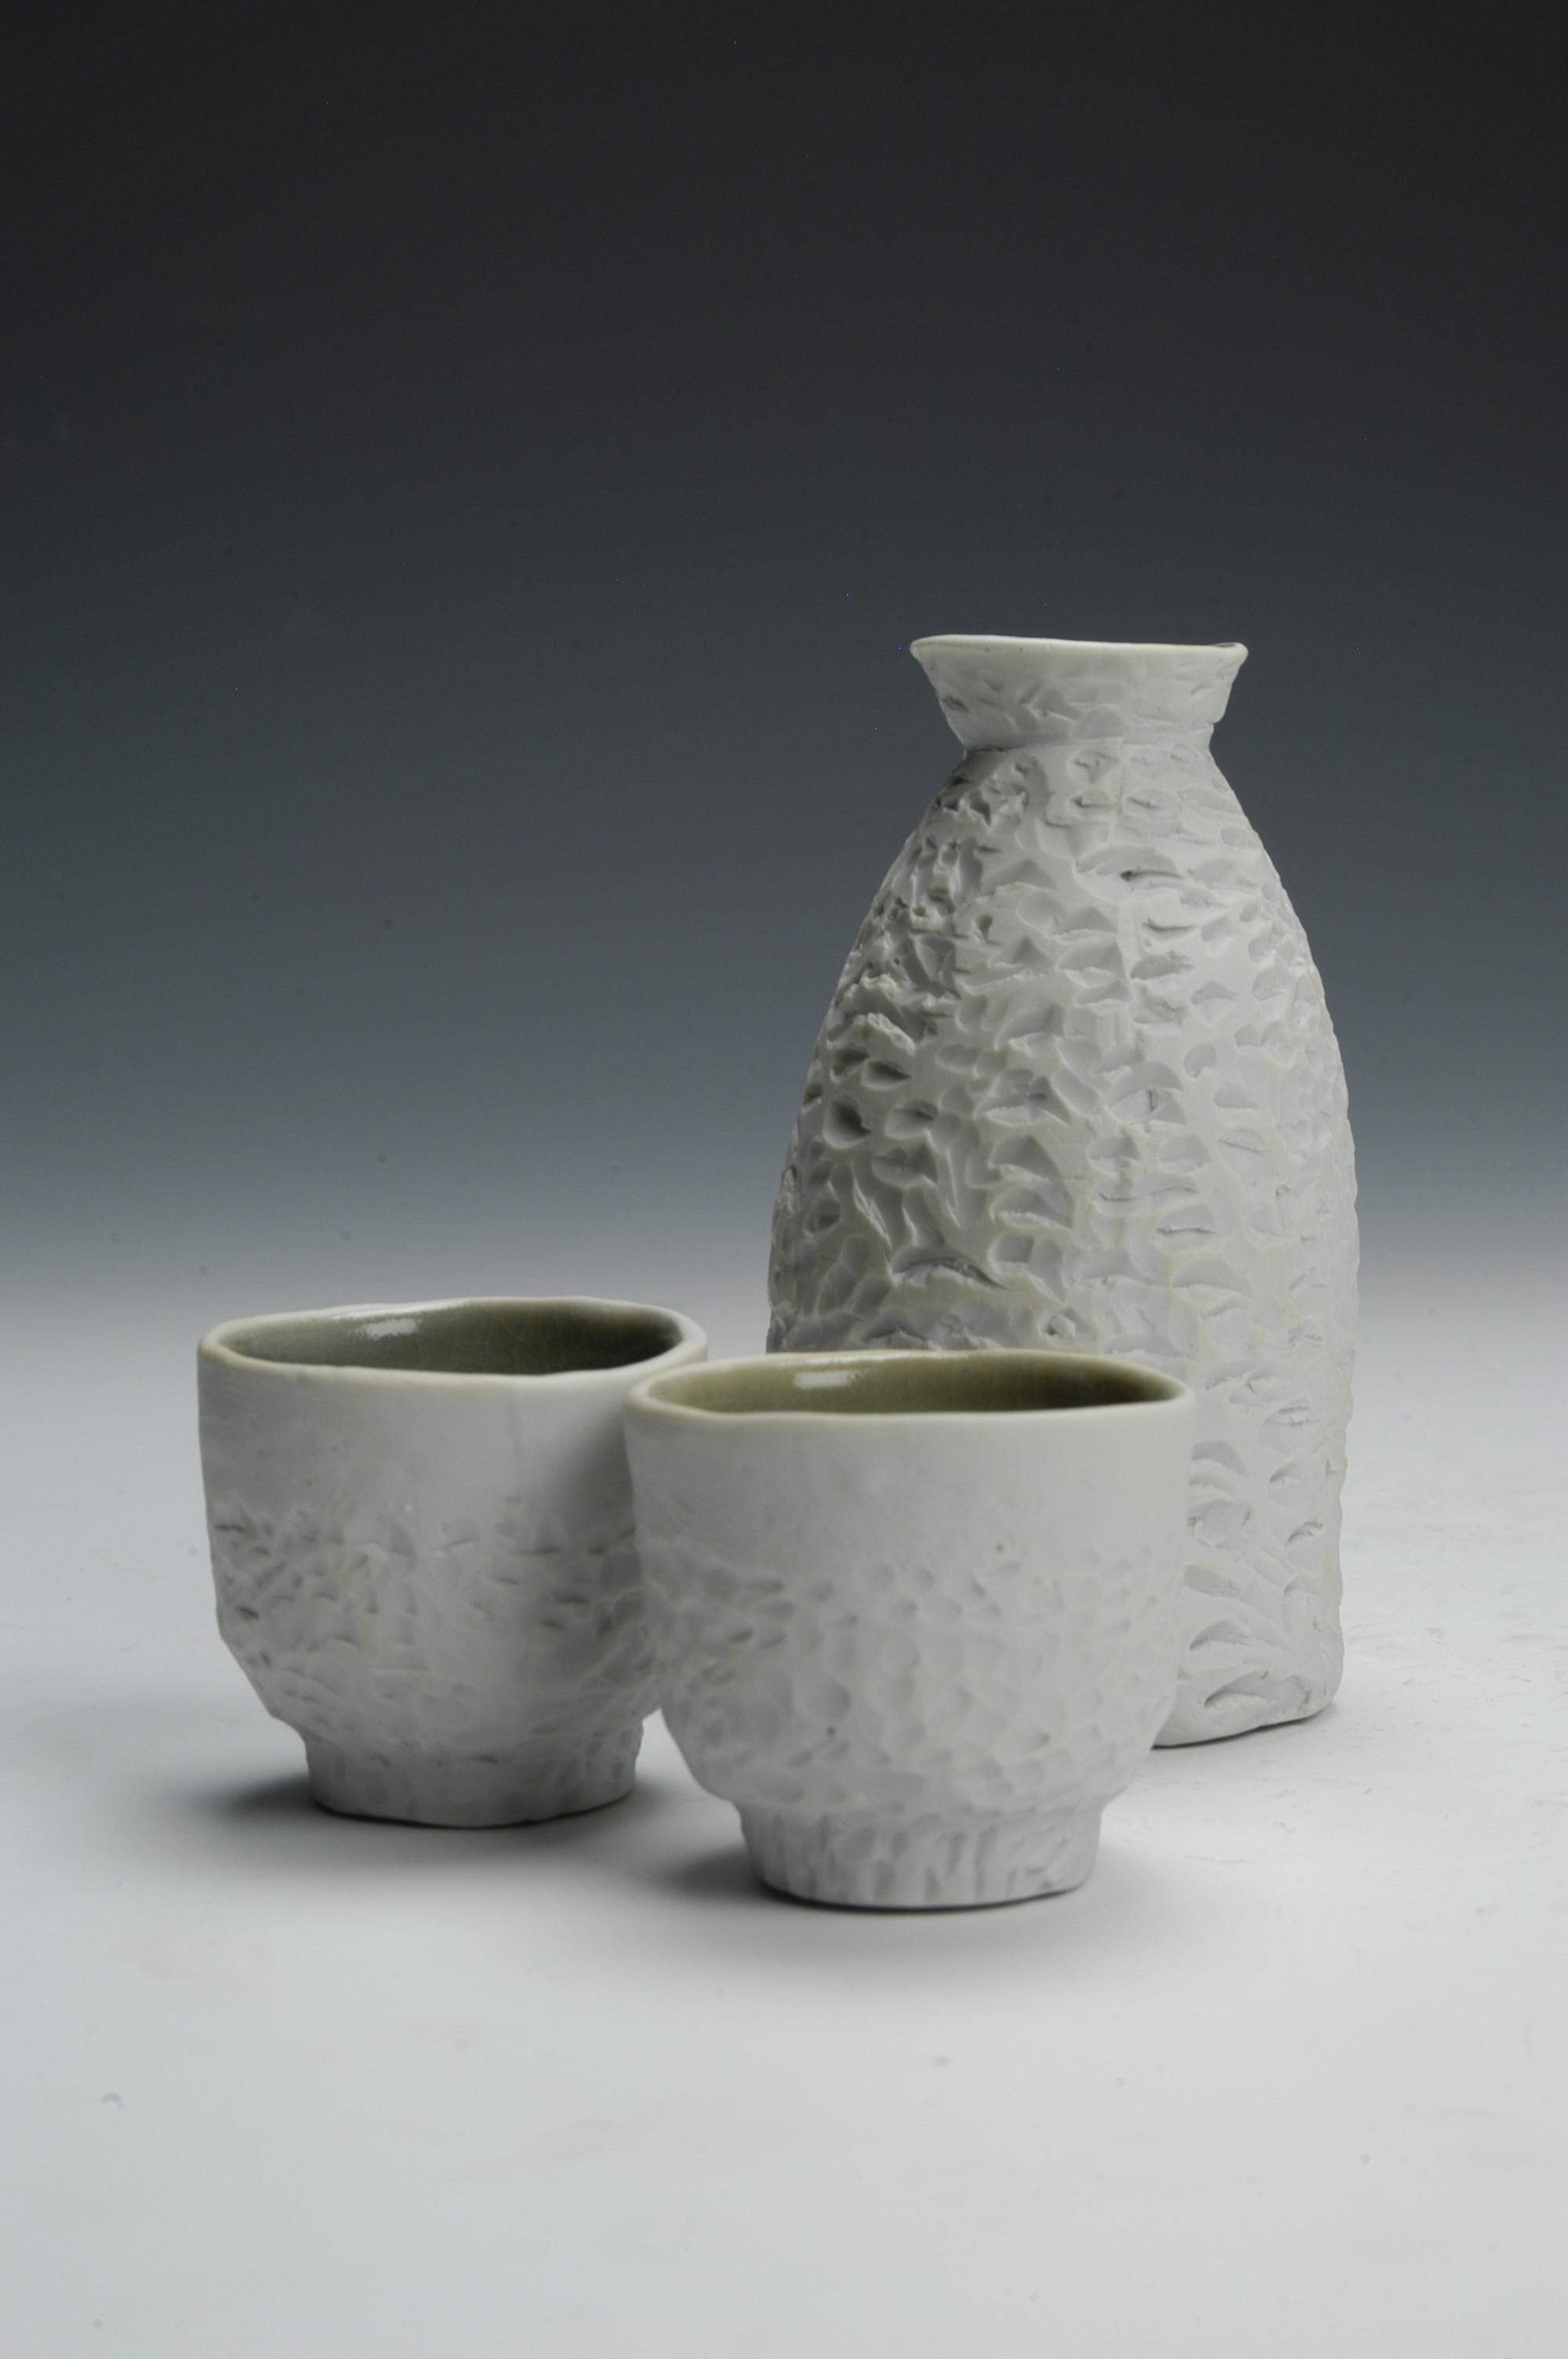 Textured Saki Set